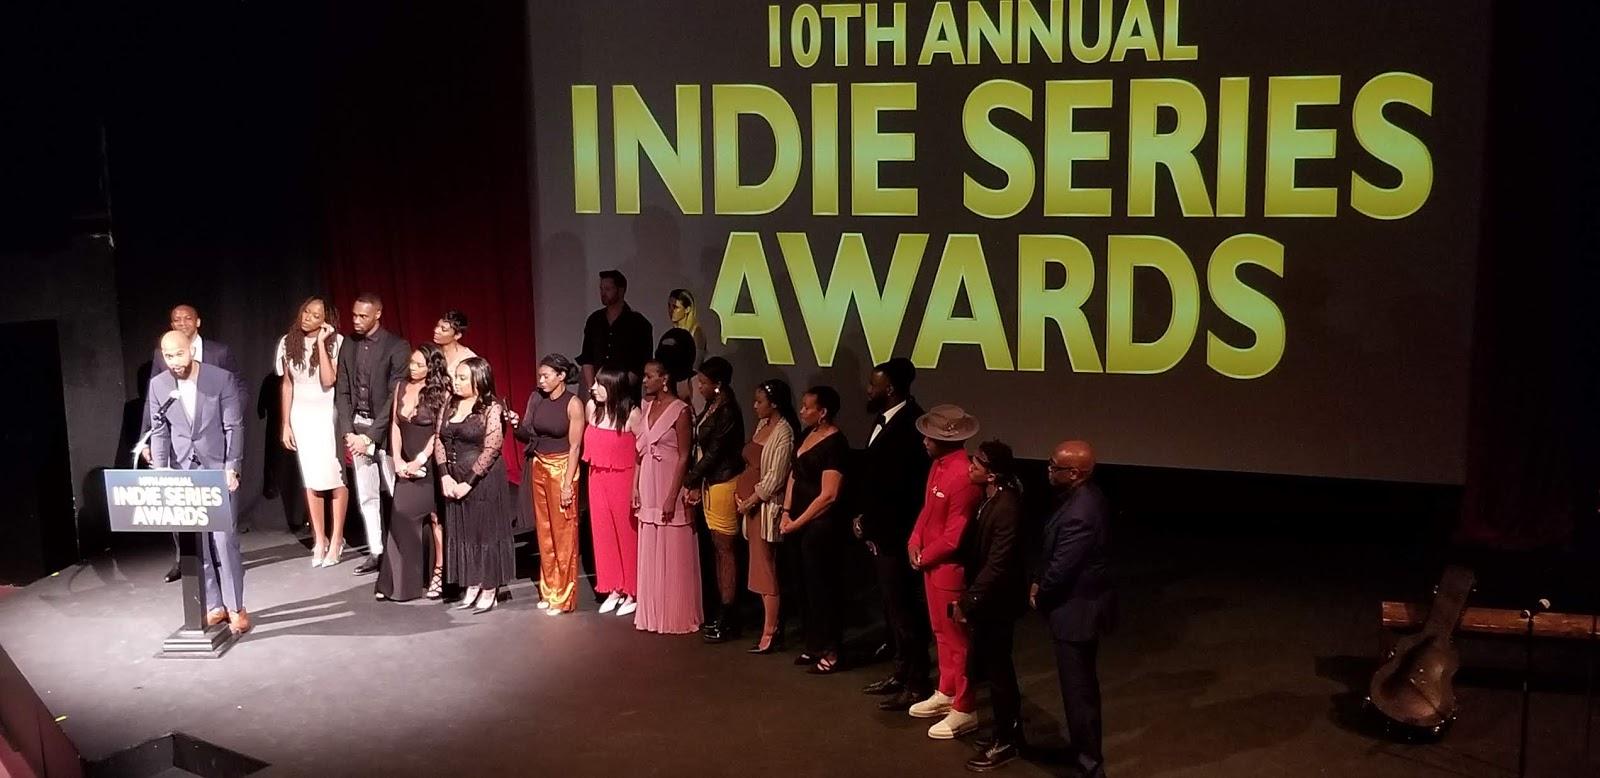 10th Annual Indie Series Awards Winners